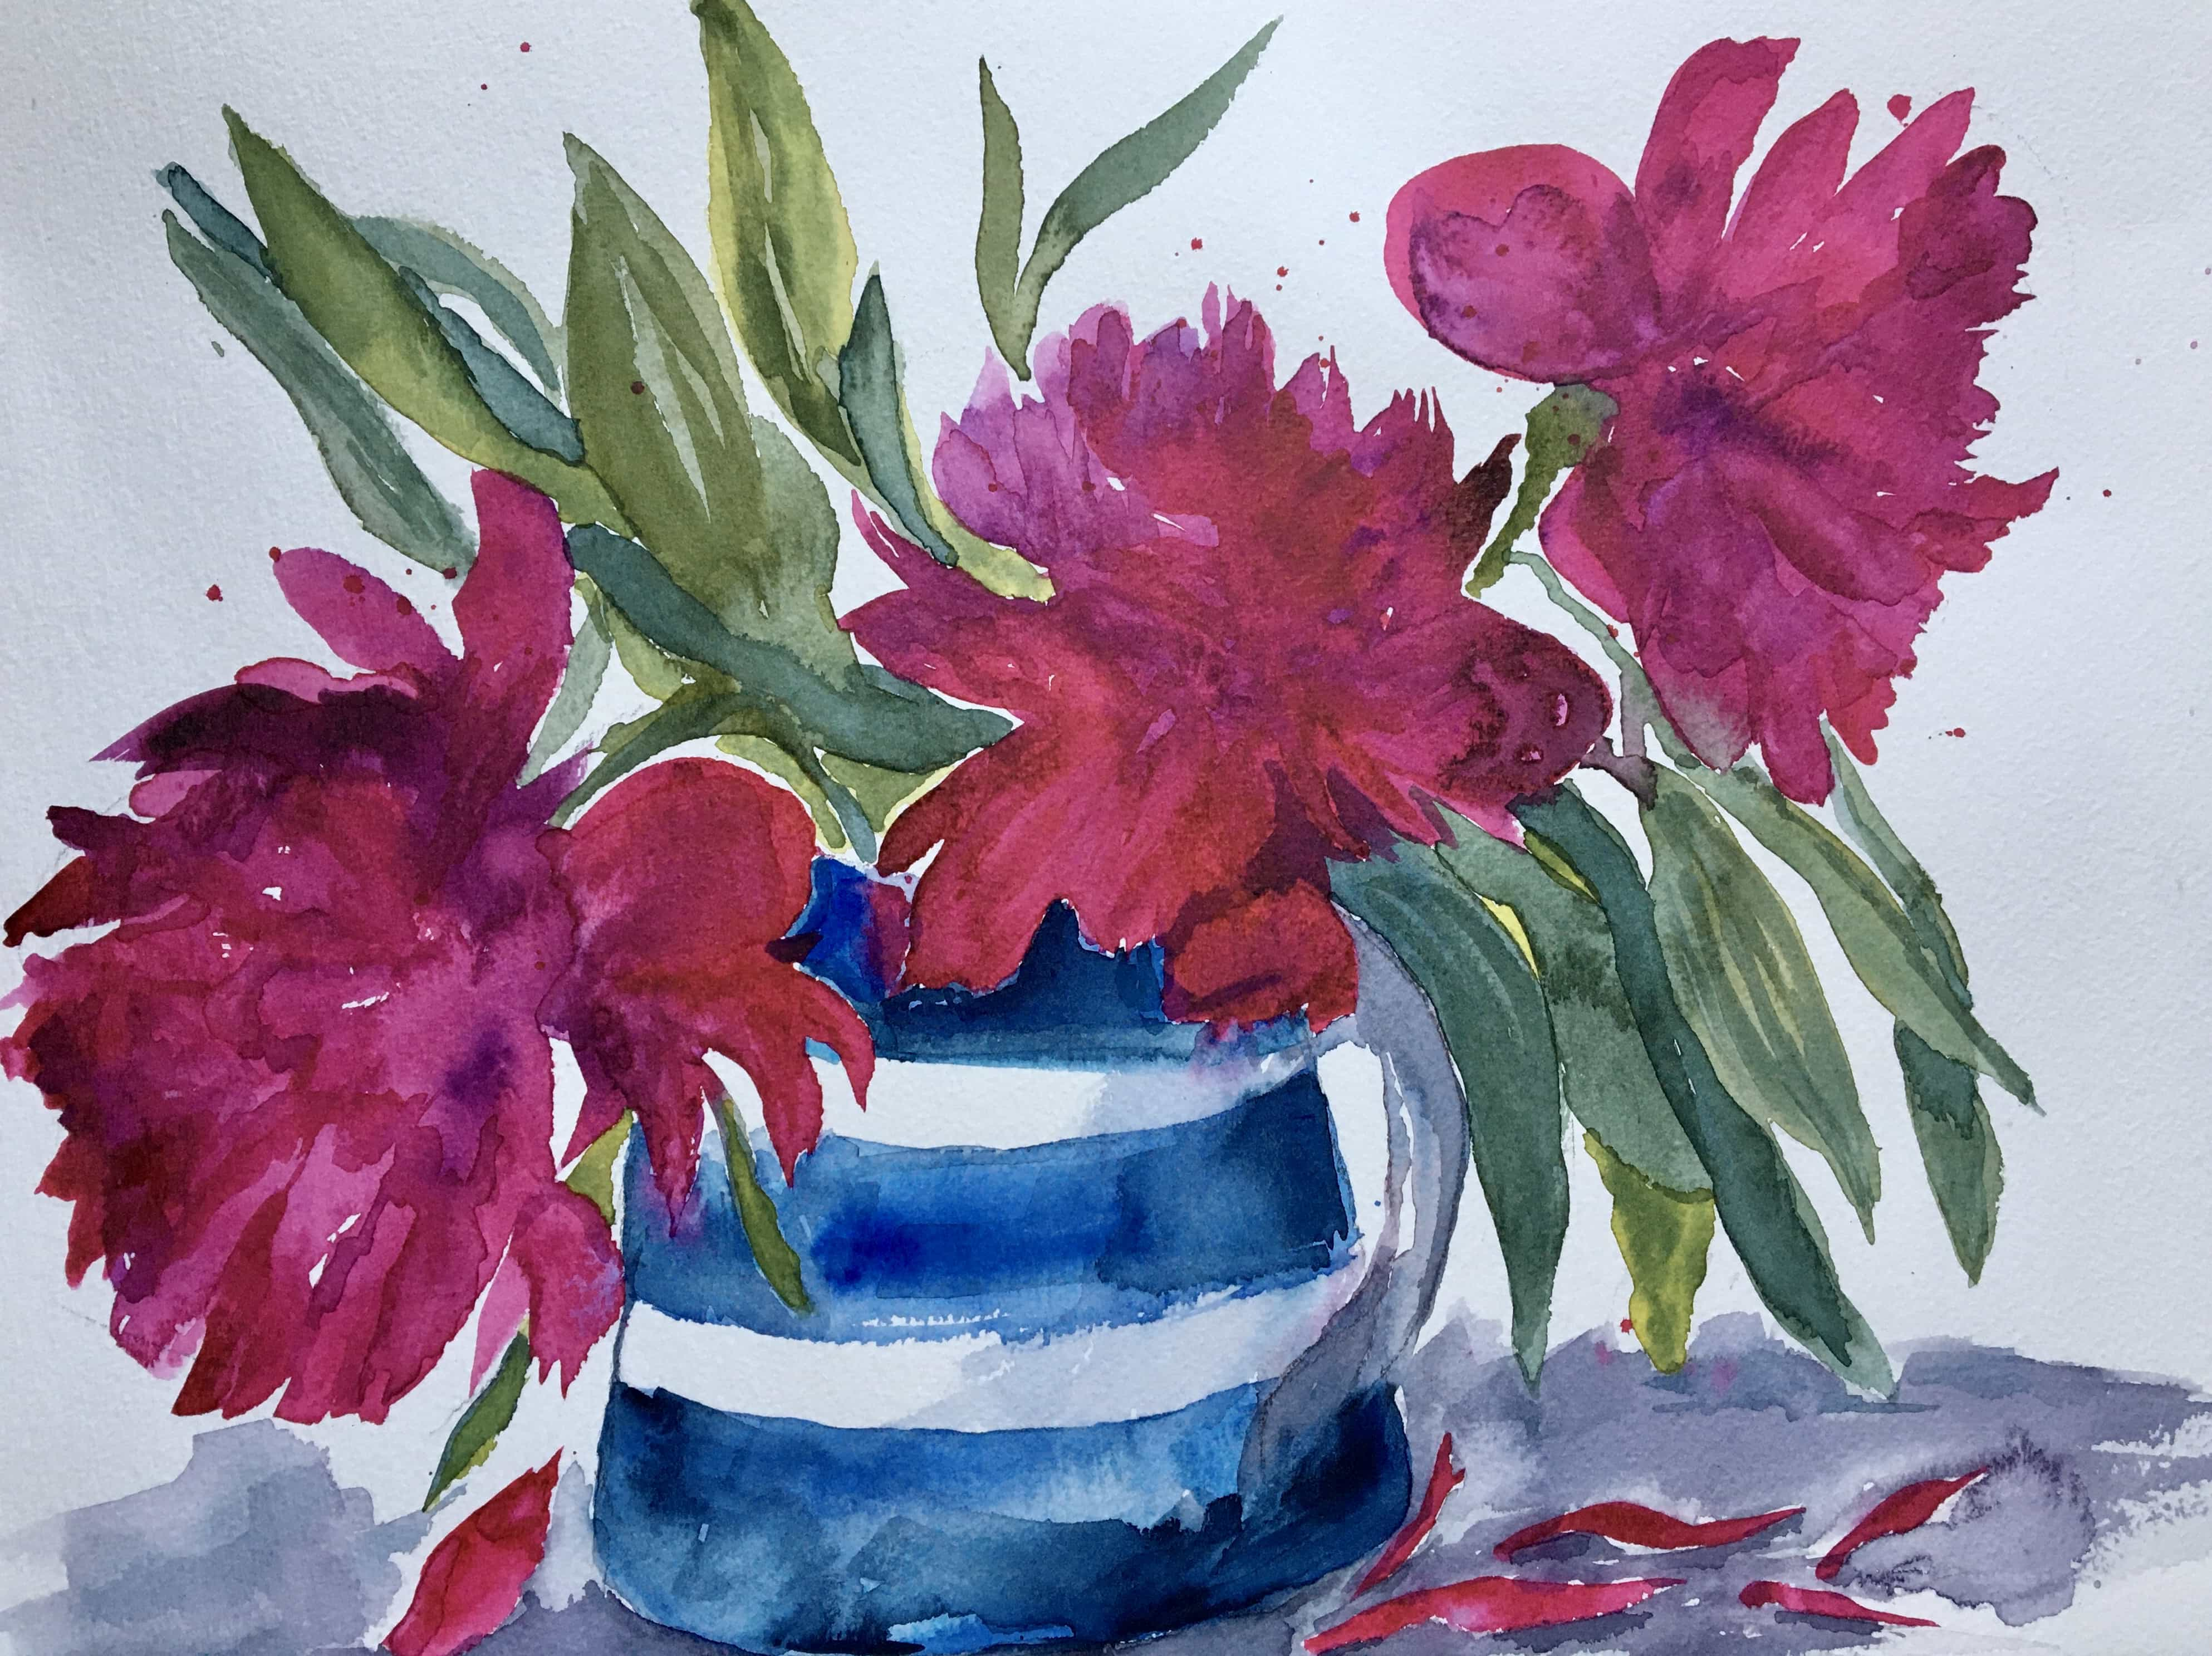 watercolour peonies blue and white striped jug cornishware